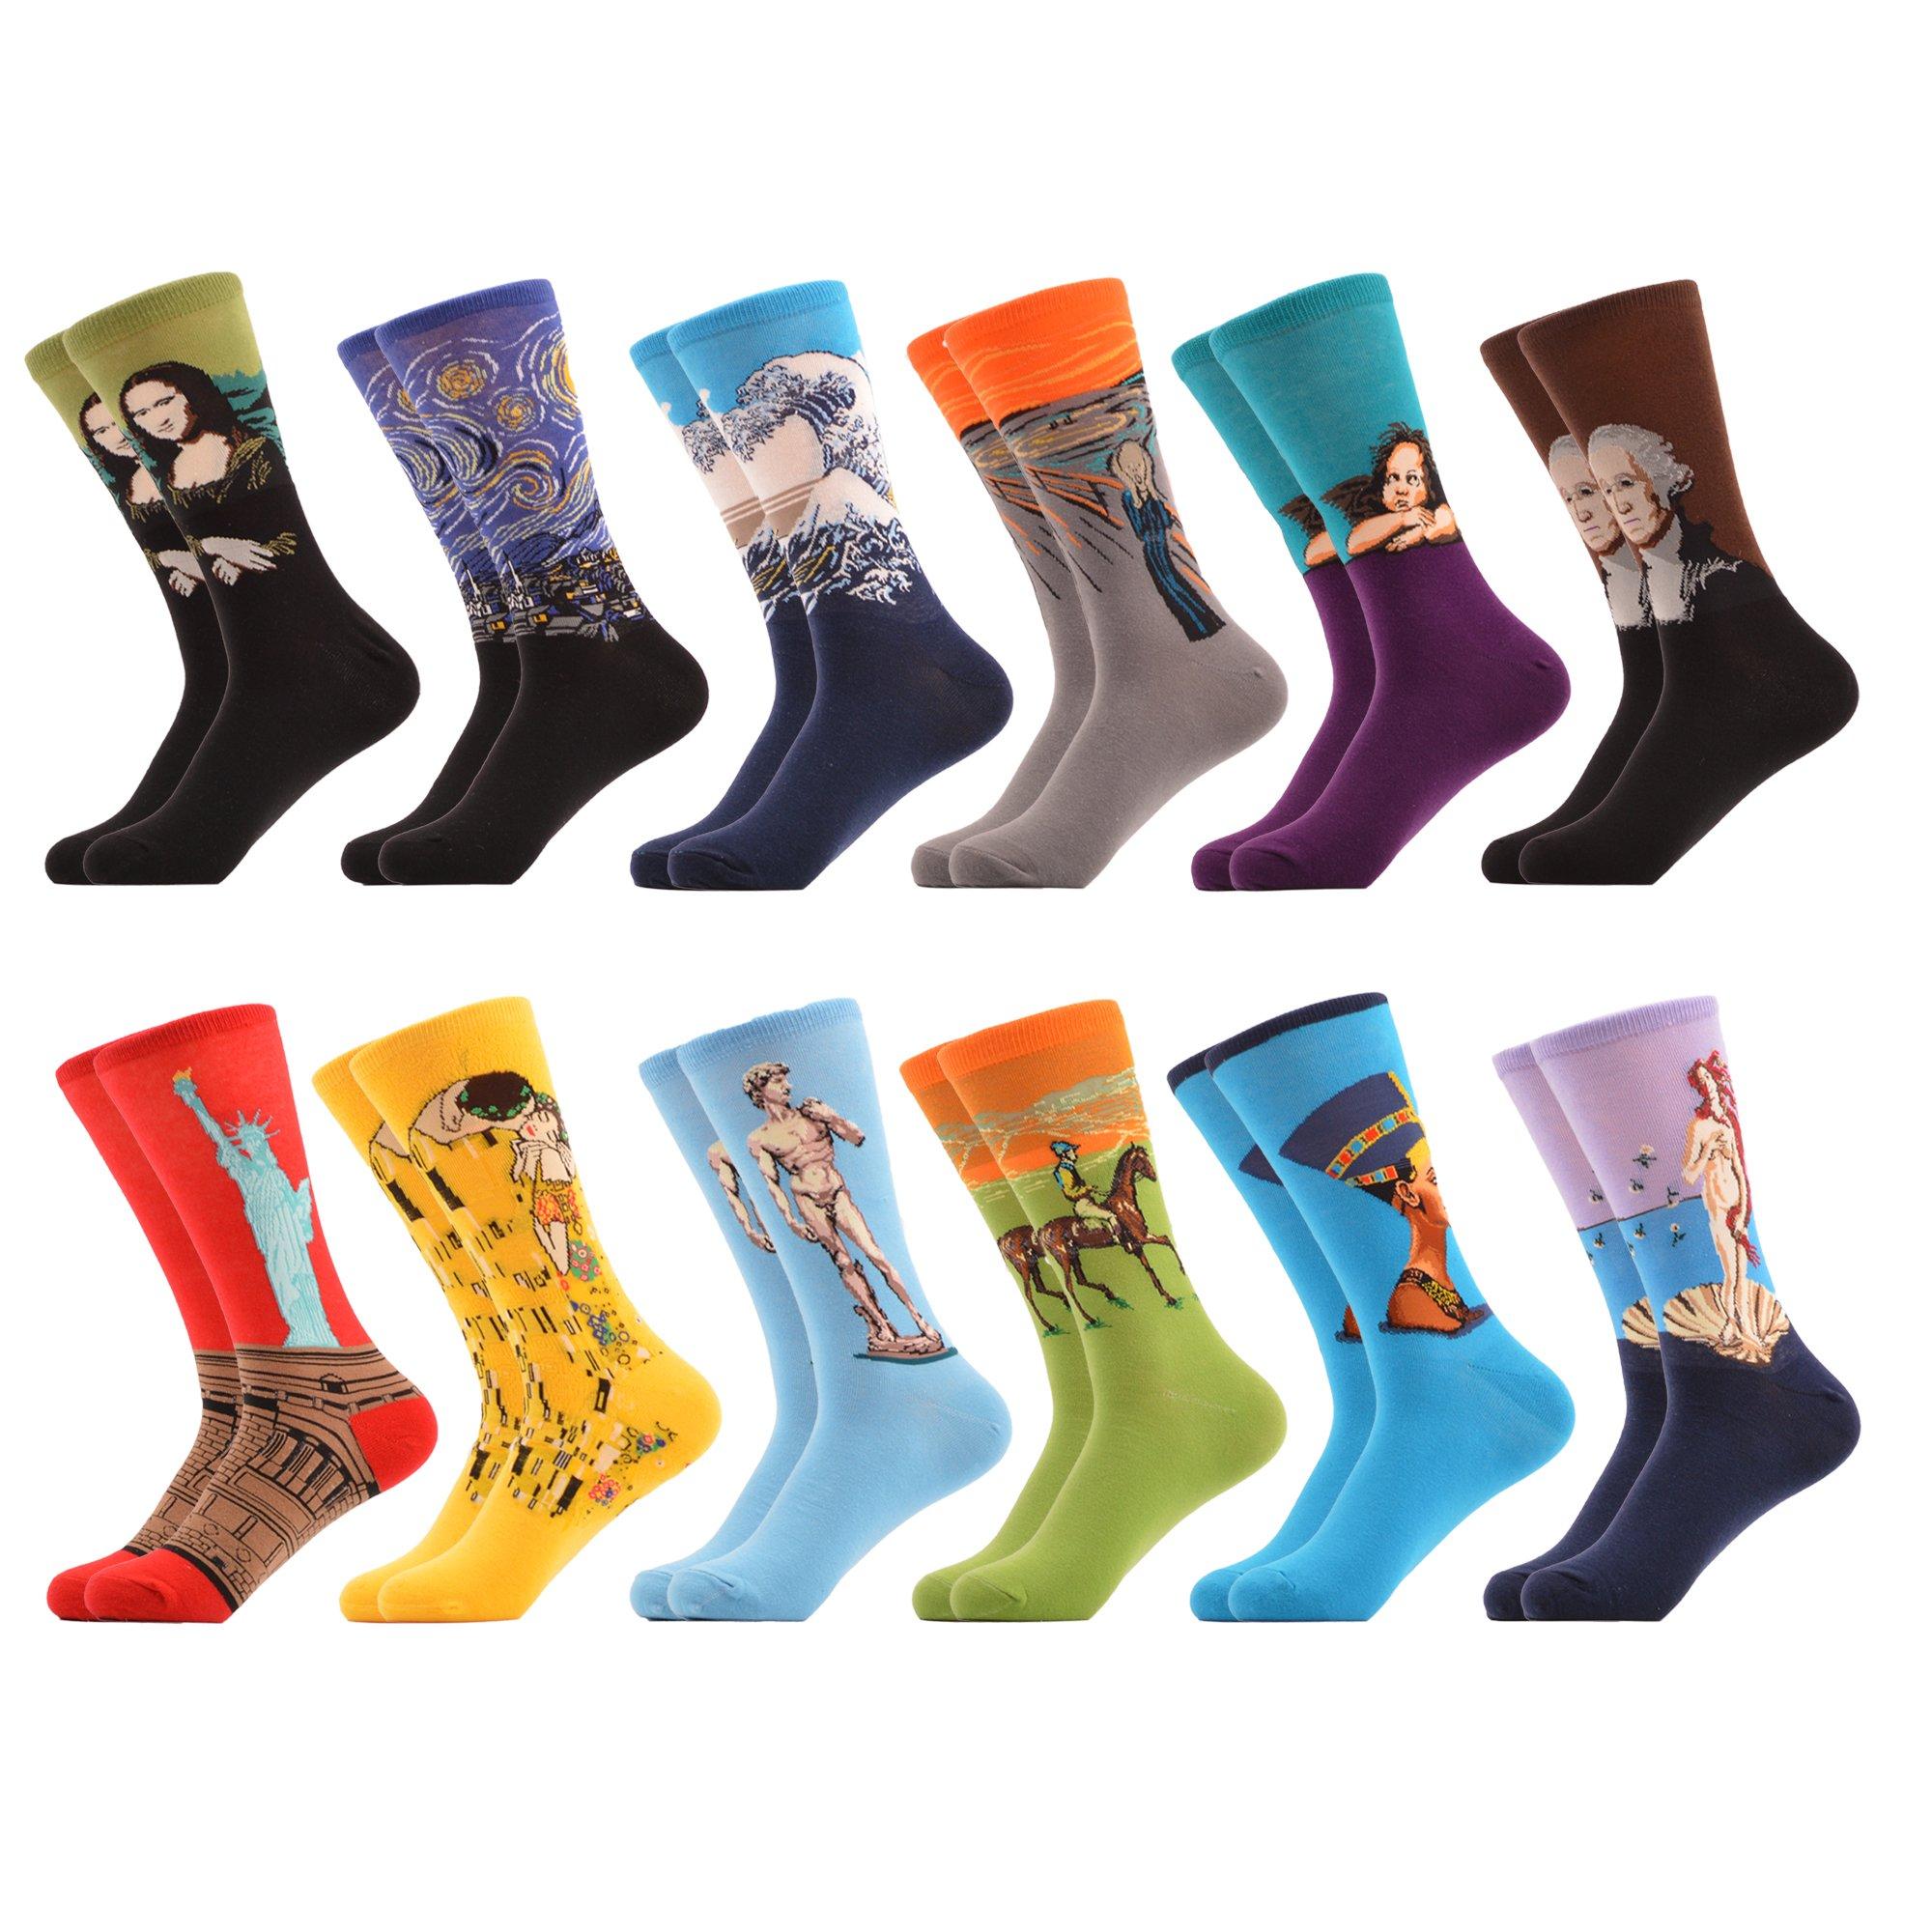 WeciBor Men's Art Van Gogh Dress Renaissance Multicolor Colorful Funny Cotton Crew Socks Wholesale 12 Packs